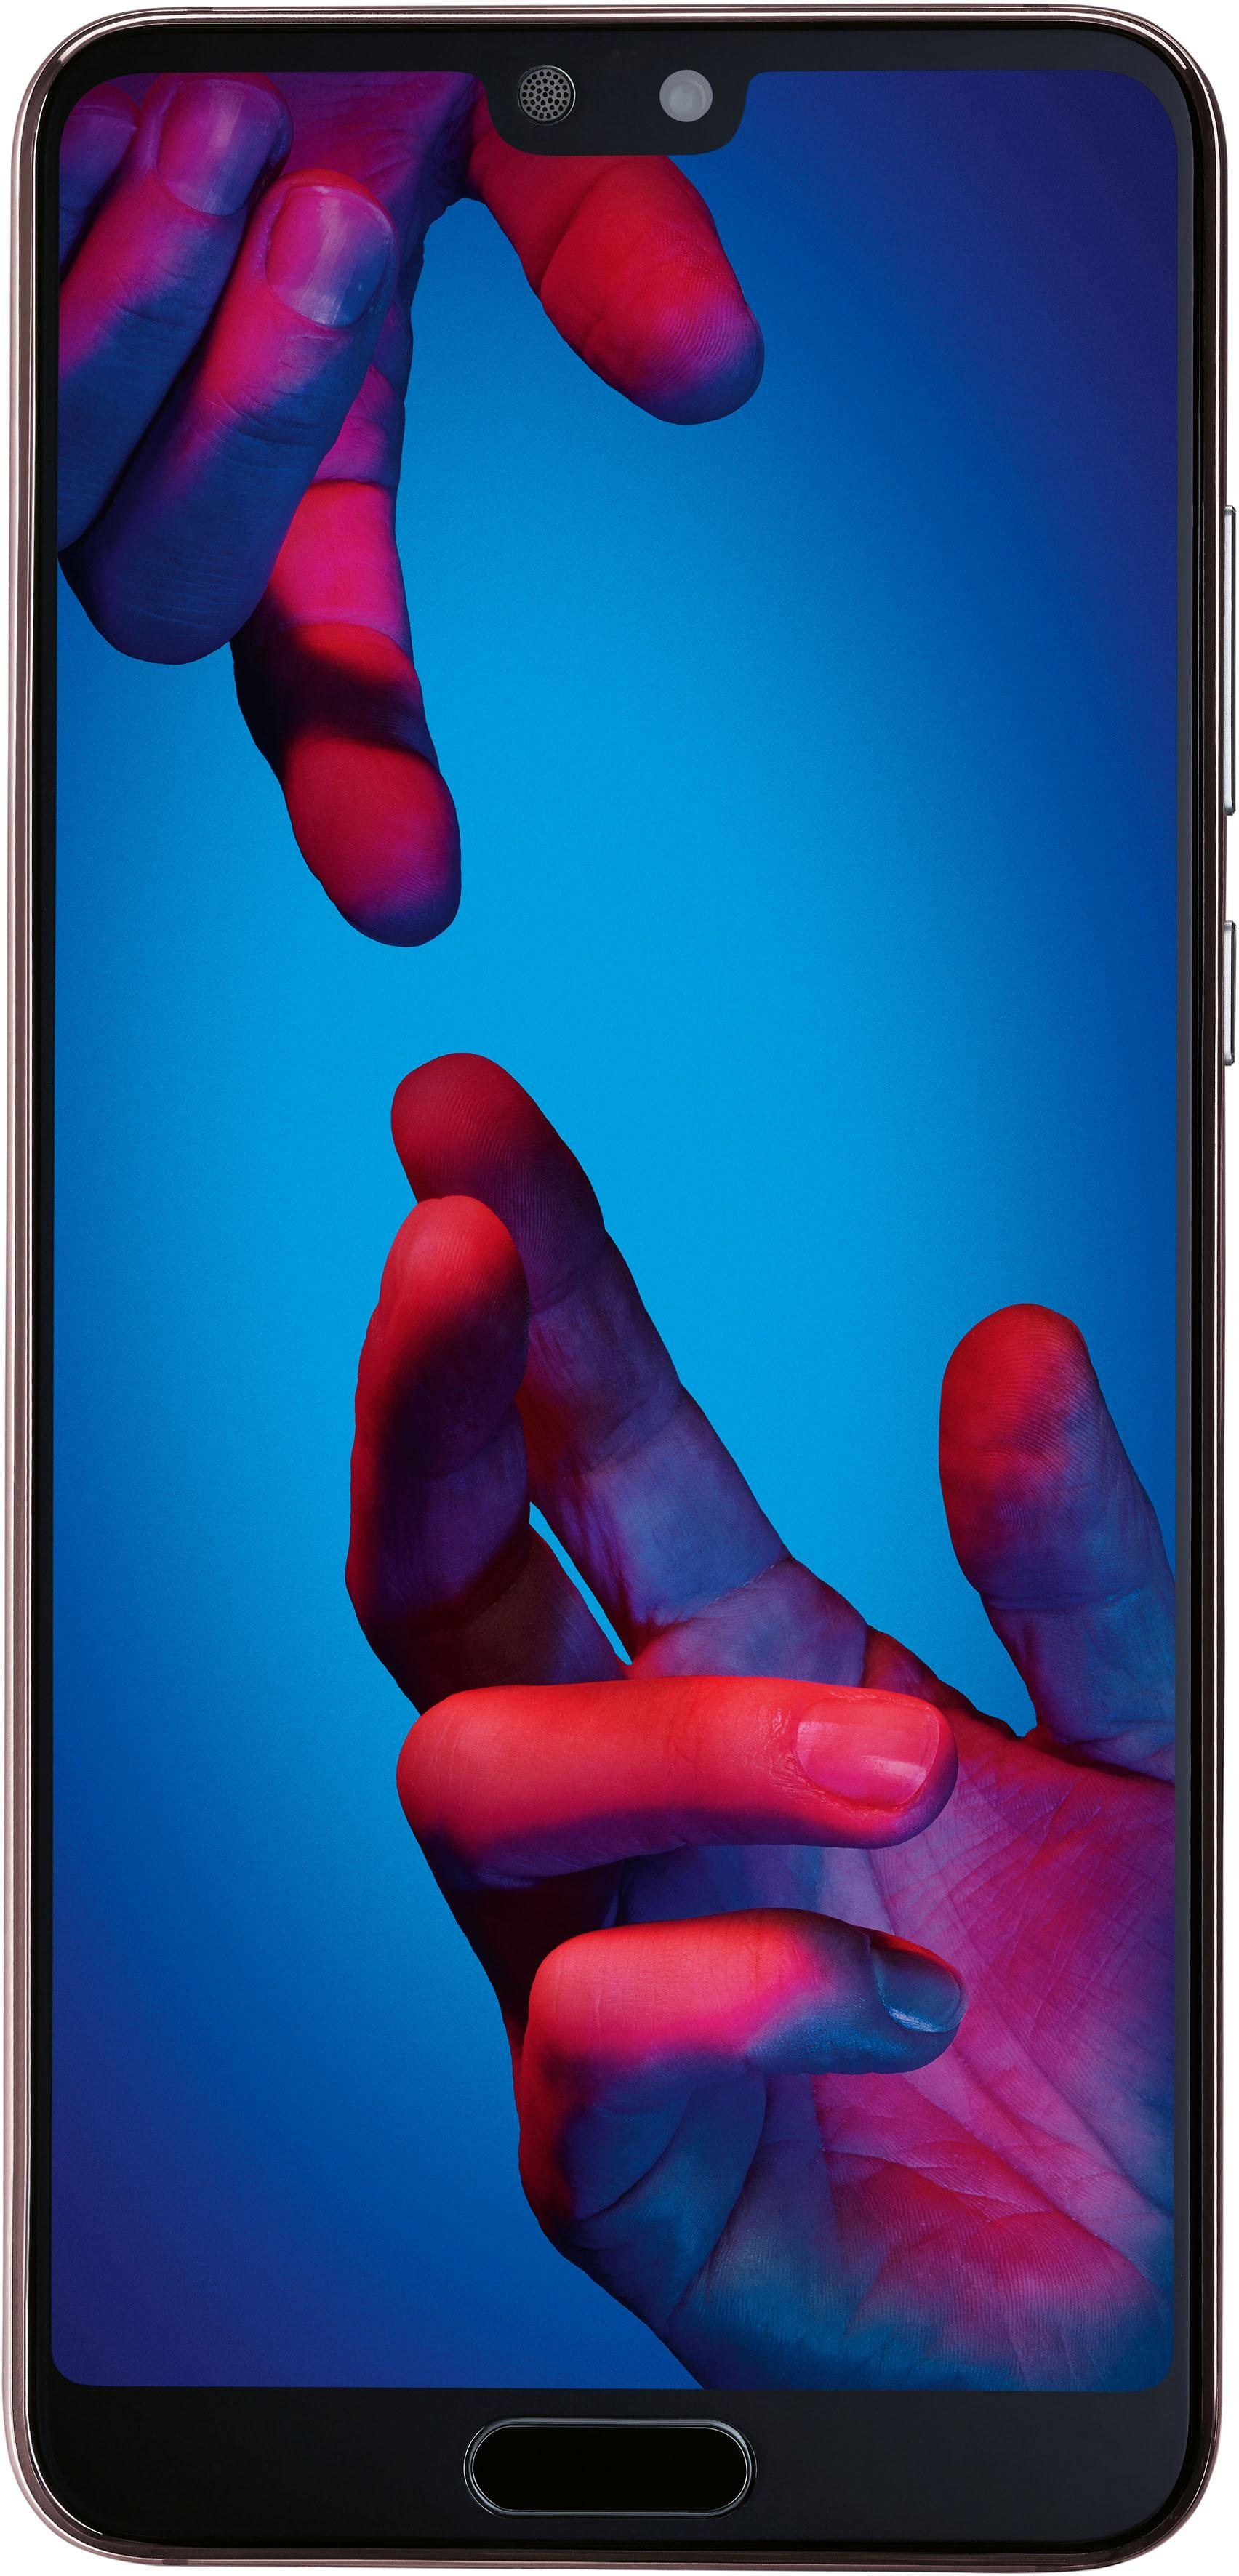 P20 Smartphone (14,7 cm/5,8 Zoll, 128 GB Speicherplatz, 20 MP Kamera)